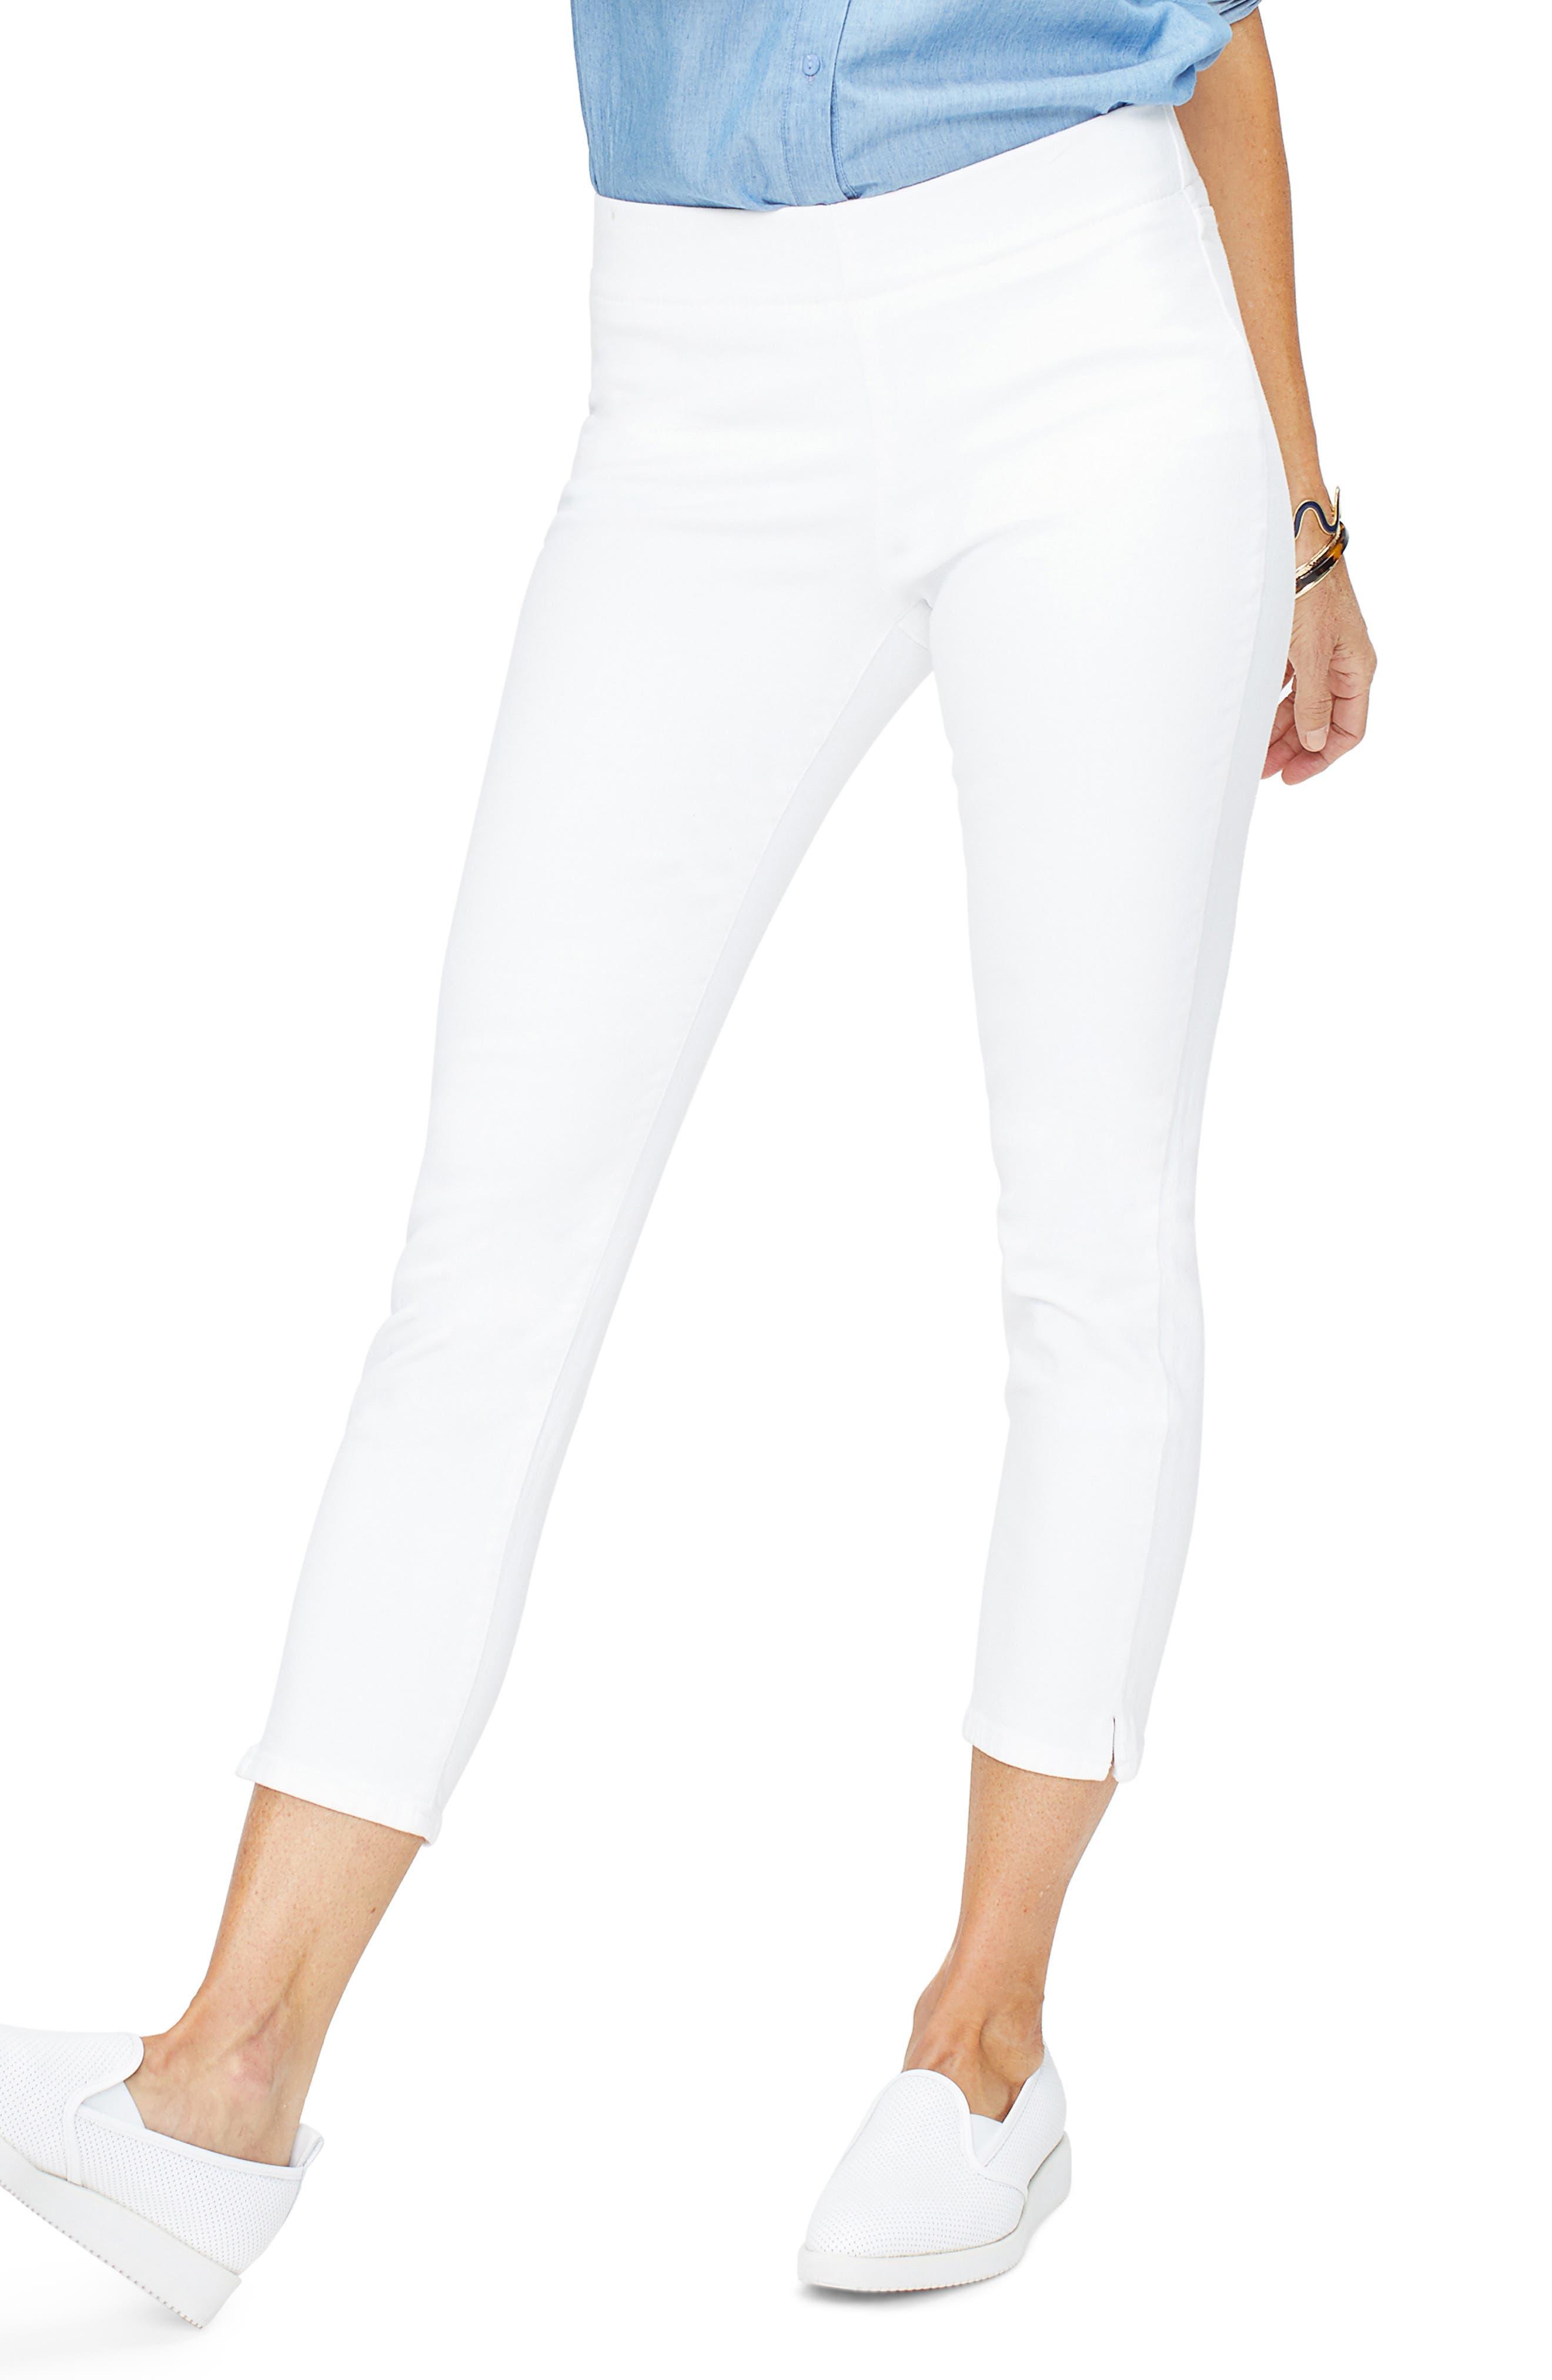 NYDJ,                             Millie Ankle Skinny Jeans,                             Main thumbnail 1, color,                             OPTIC WHITE